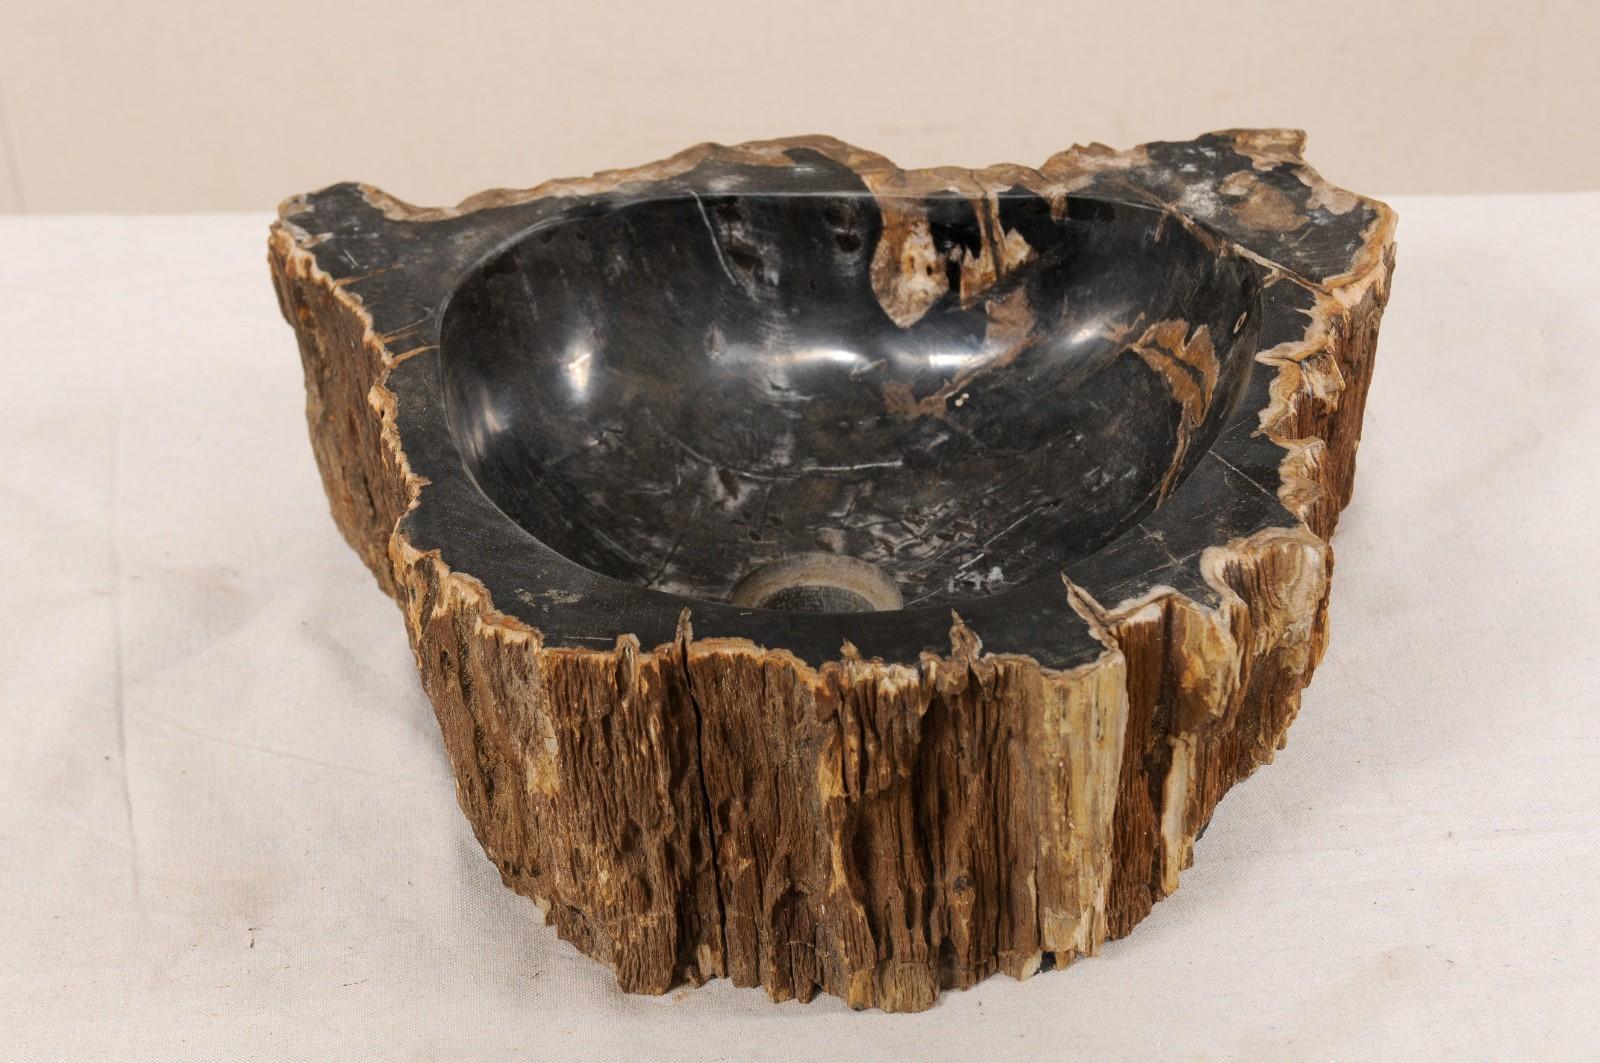 Single Black And Brown Polished Petrified Wood Sink Wash Basin